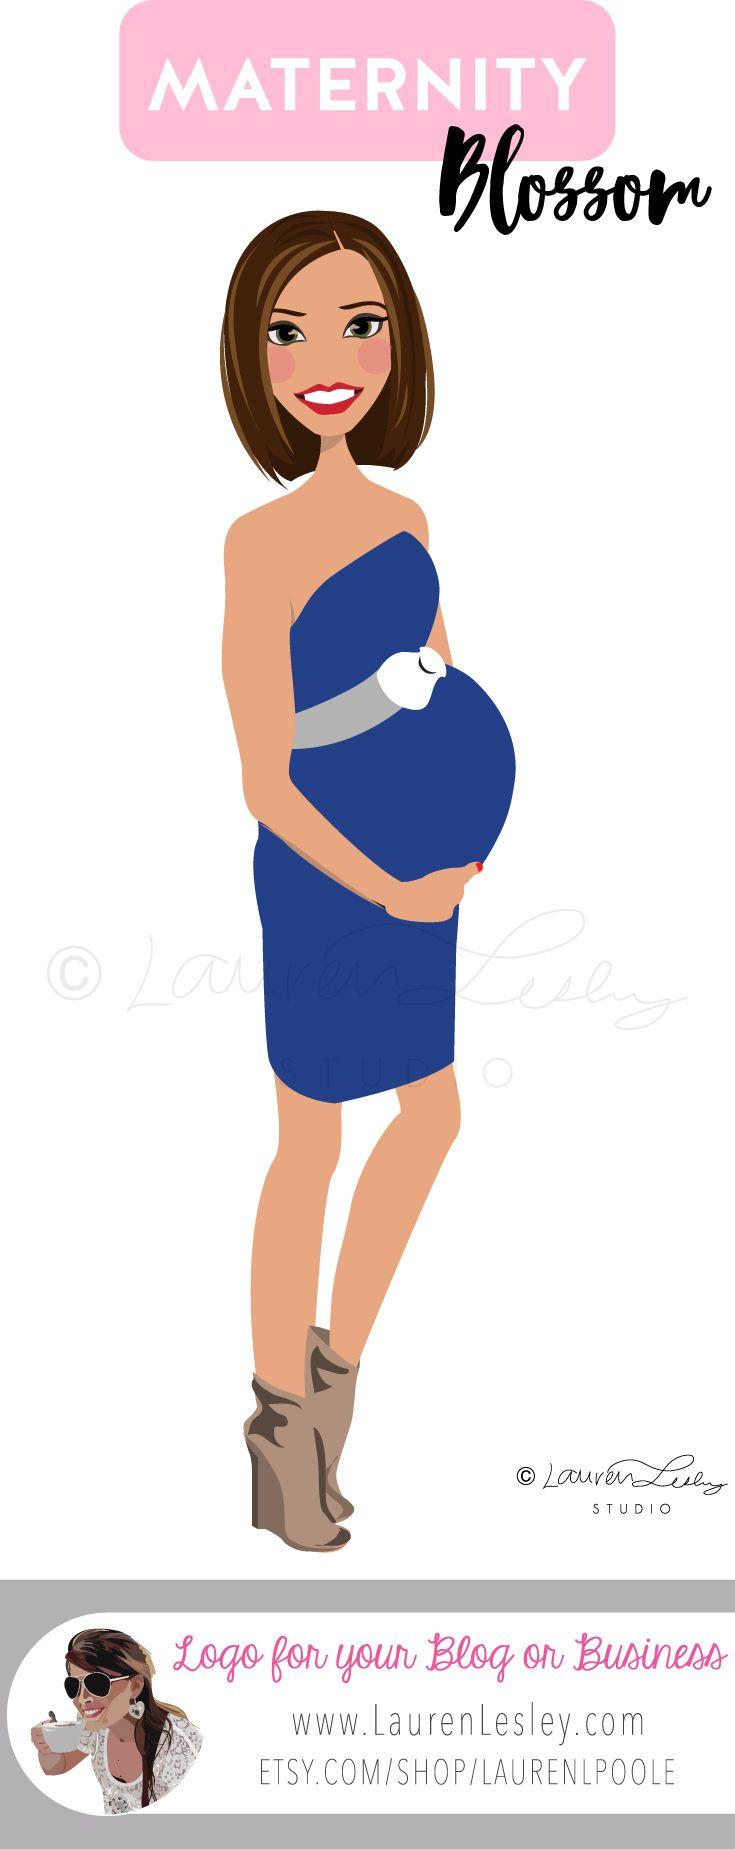 Maternity Portrait | New Mom | Pregnant Lady | Pregnant Woman | Pregnancy Logo | Logo for Blogger | Influencer Logo | Clip Art | Illustration | Design | Avatar | Custom Personalized Maternity Logo